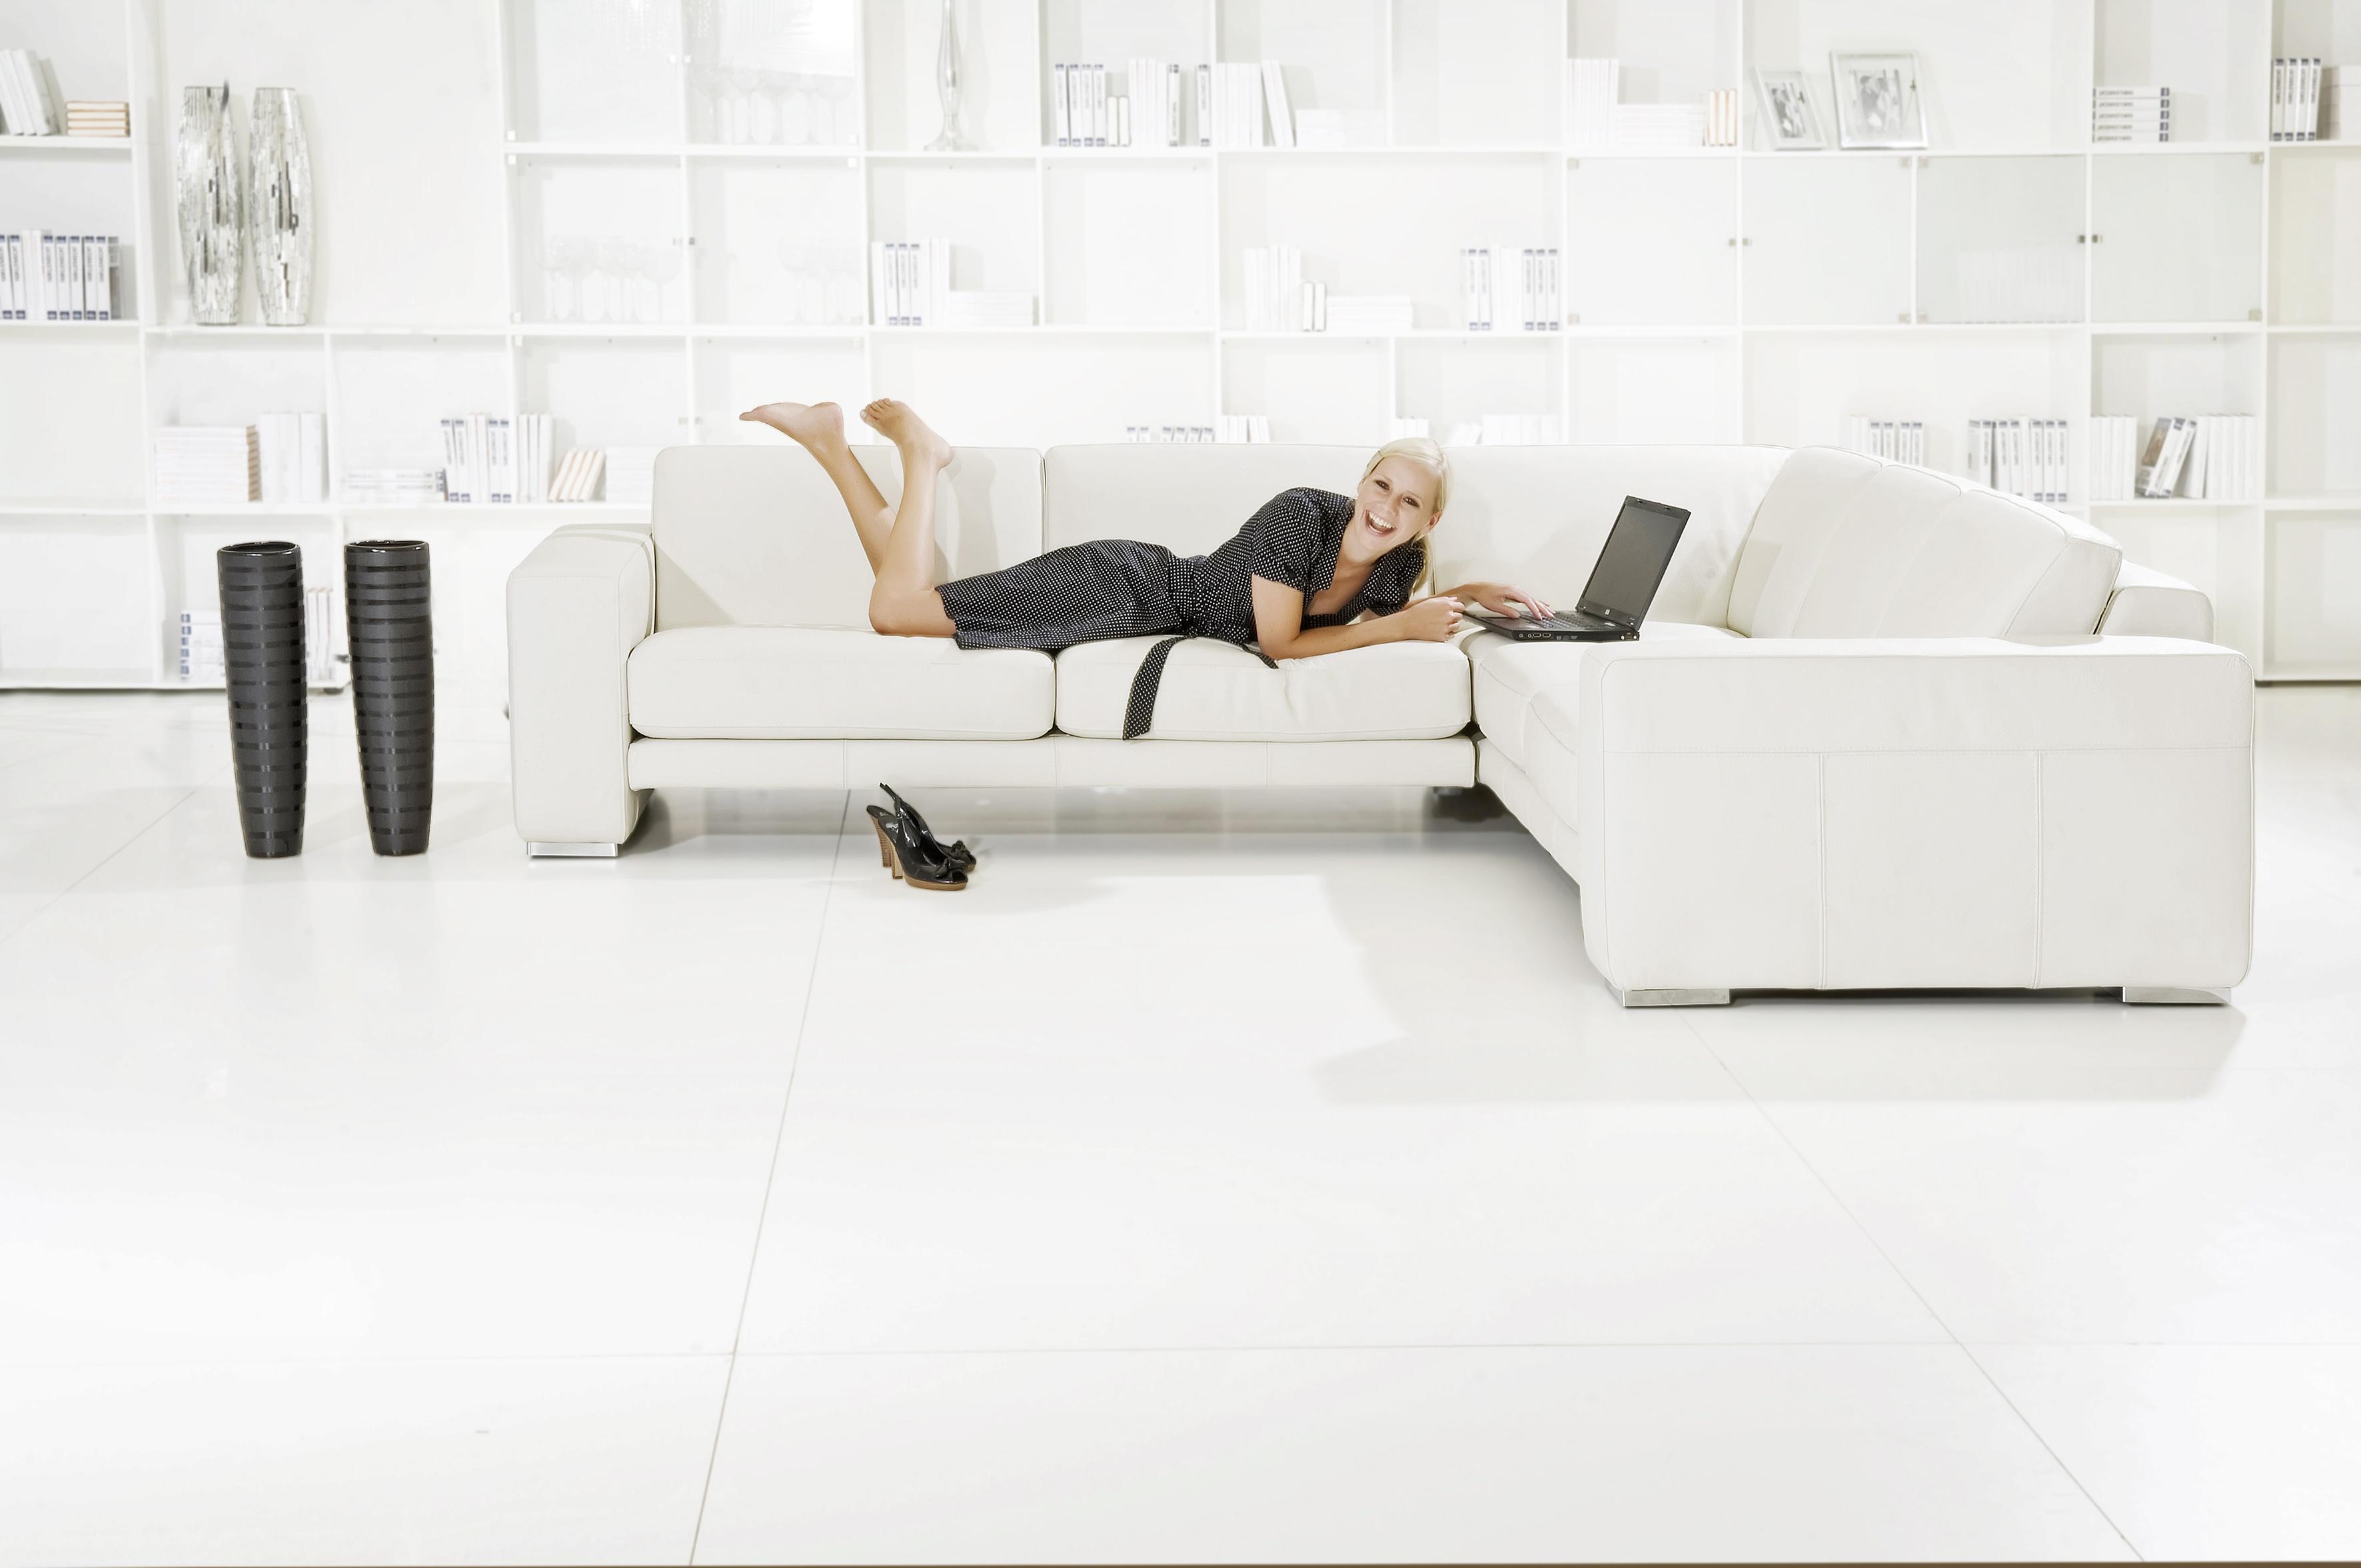 Sofá de esquina moderno color blanco acolchado